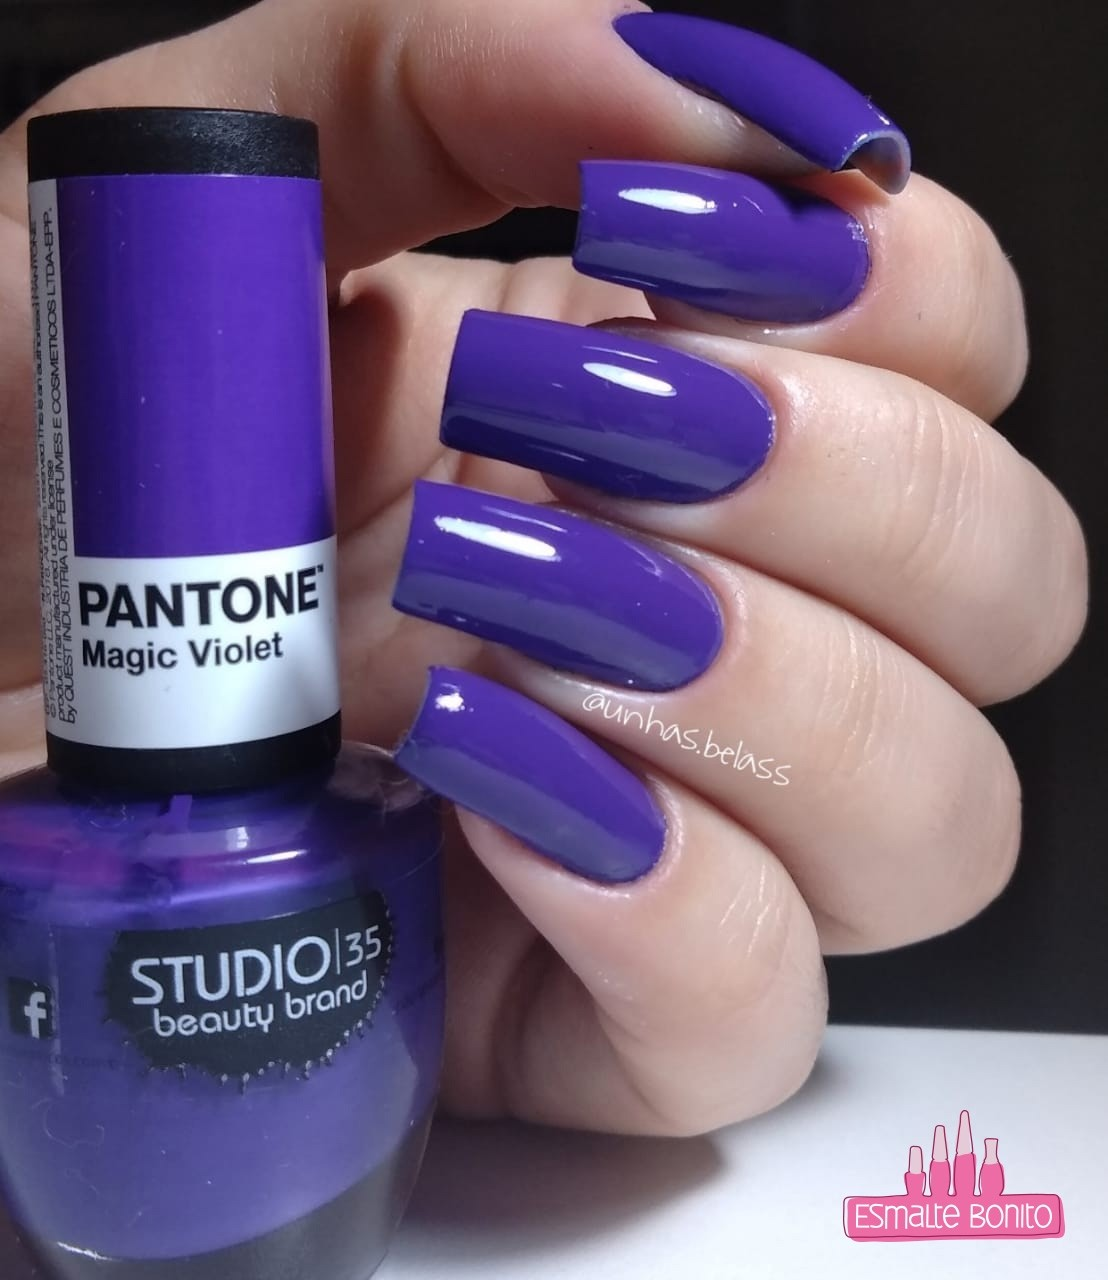 Esmalte Studio 35 Magic Violet Coleção Pantone